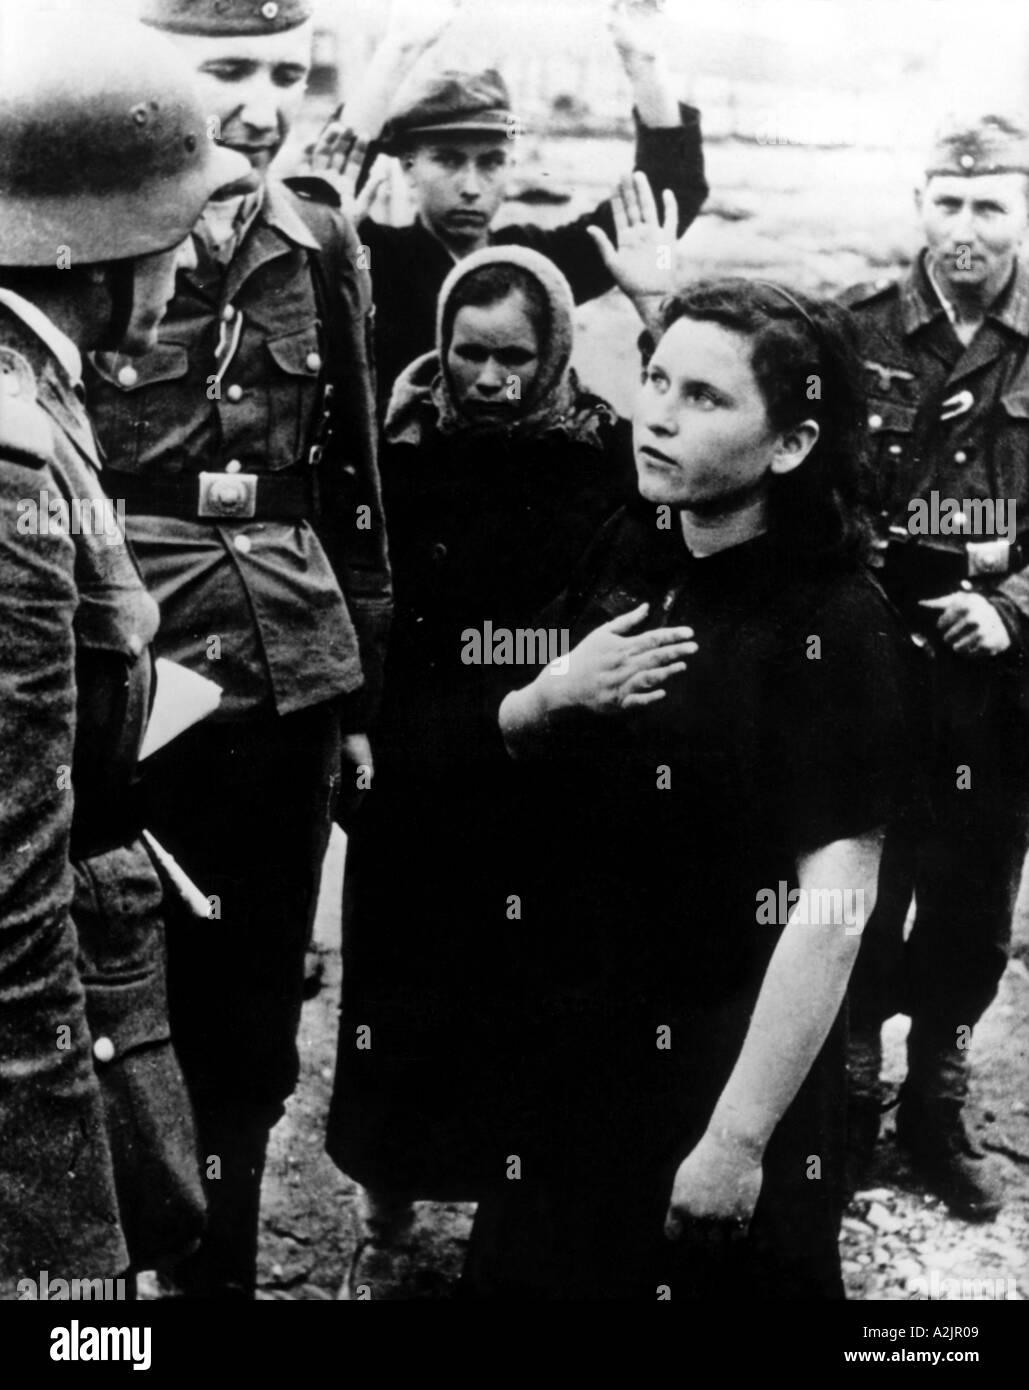 WW2 German troops question a Russian woman - Stock Image